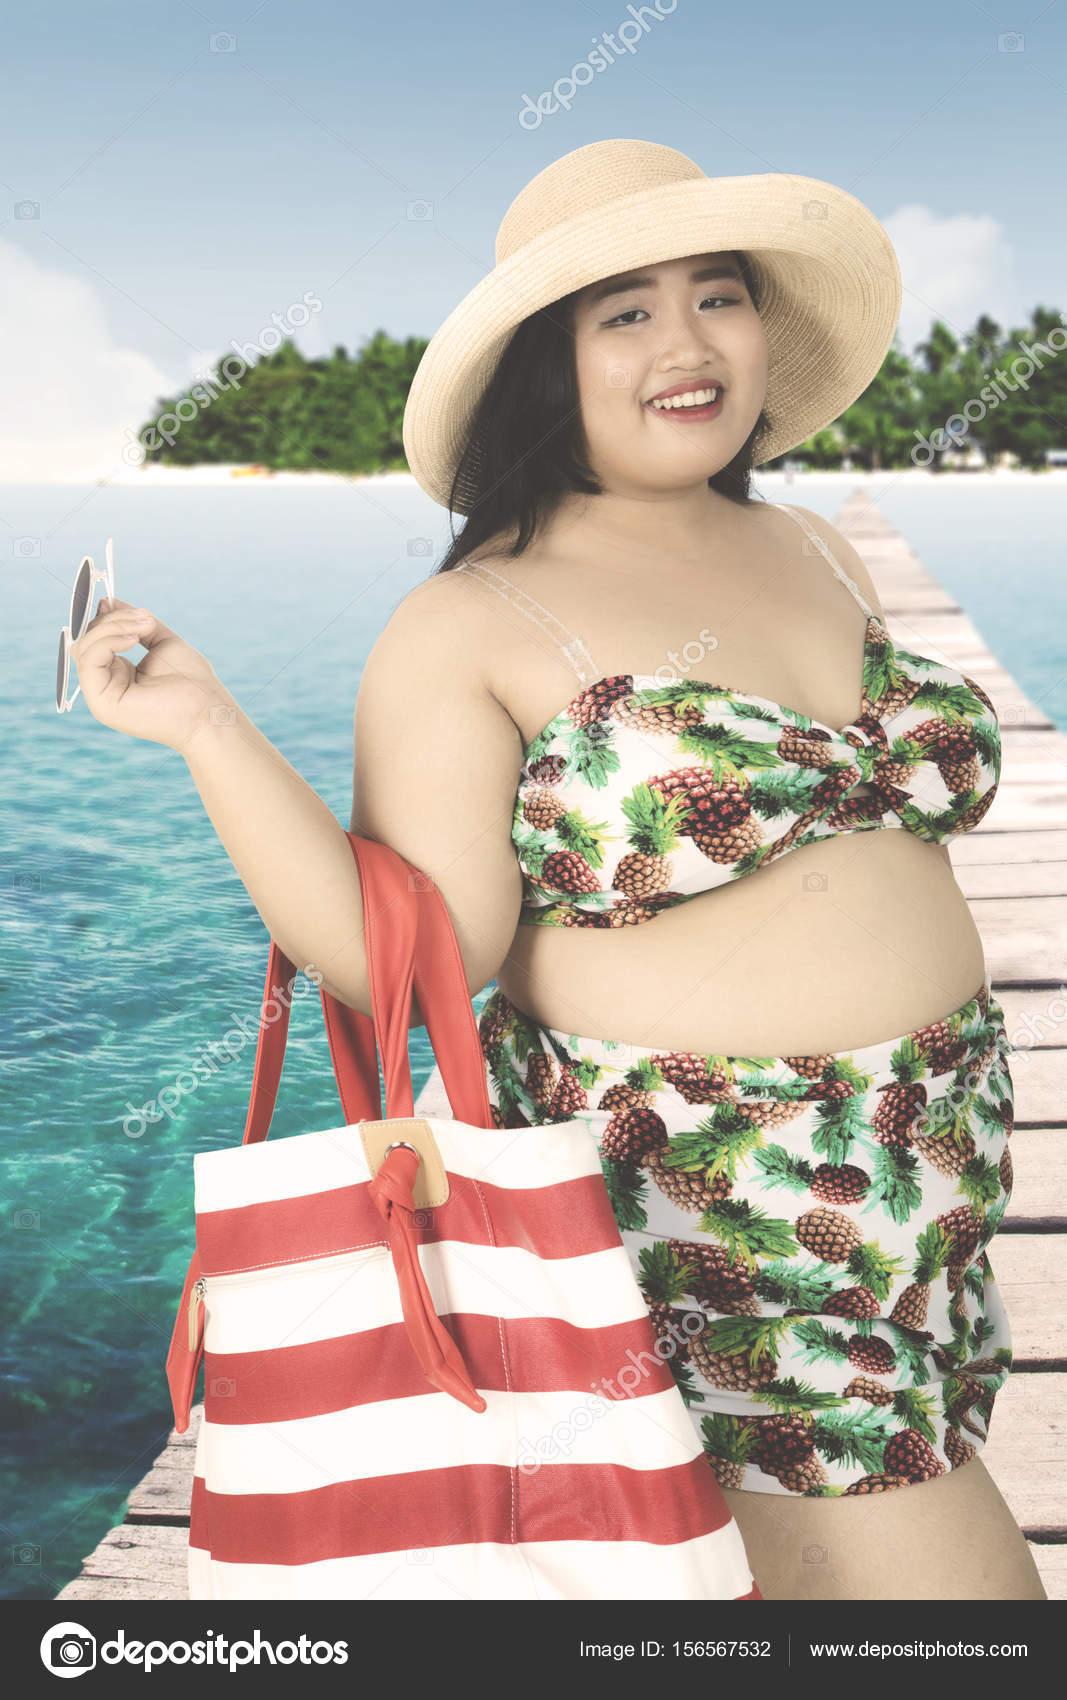 Bikini Obese On With Jetty Woman 534jLAR